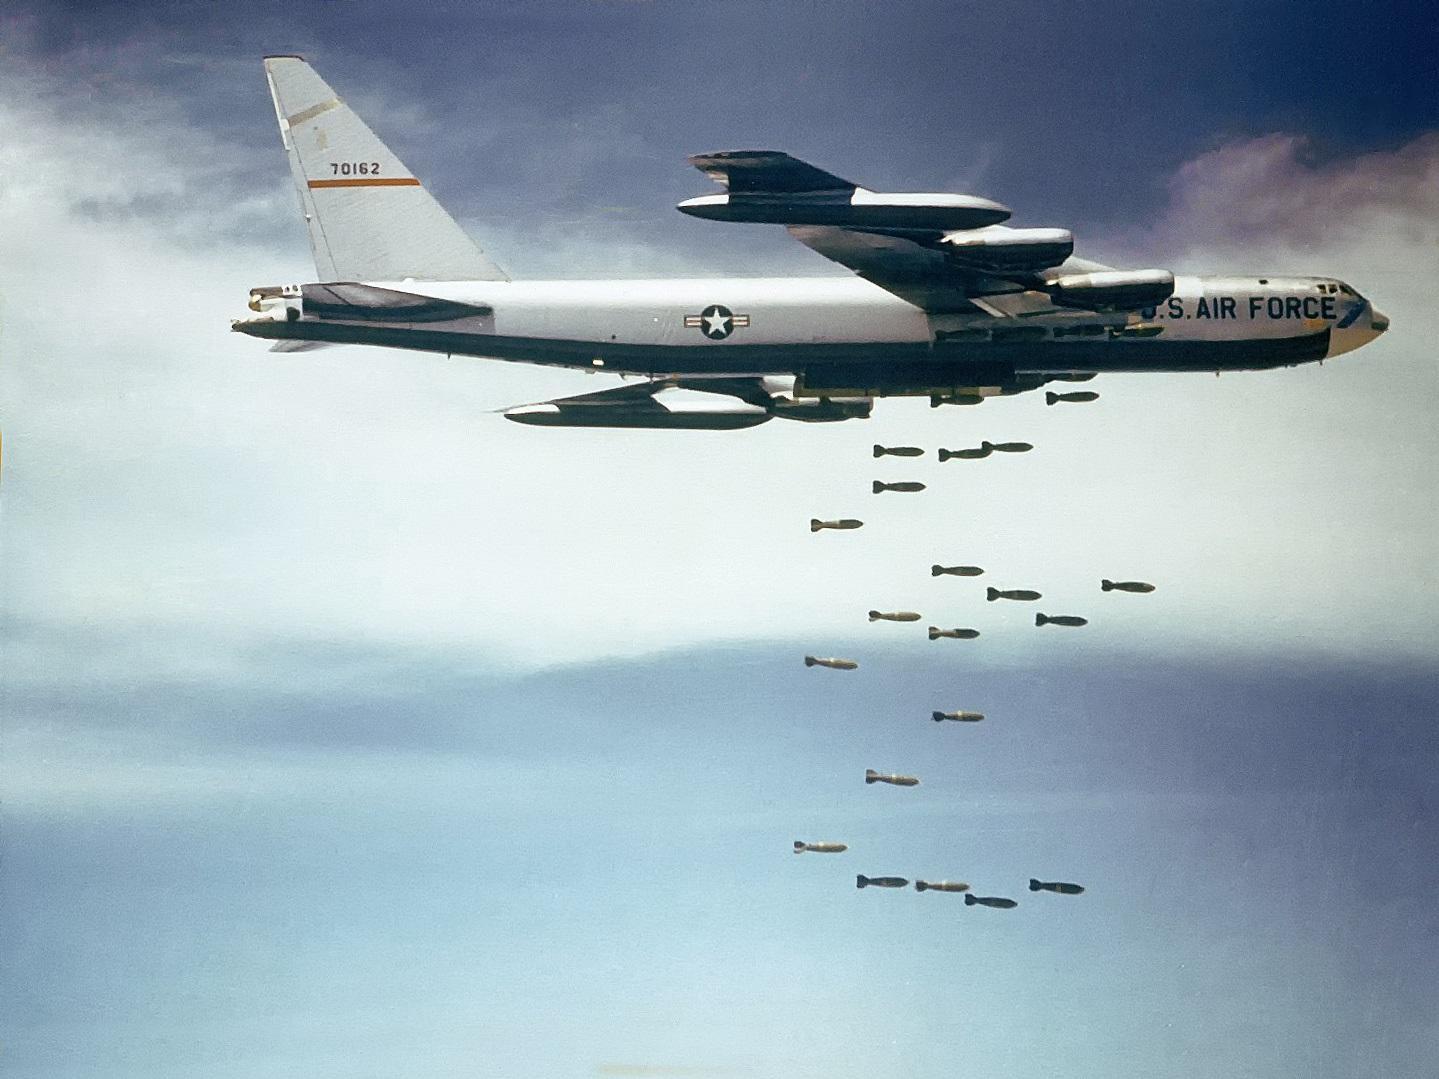 Boeing_B-52_dropping_bombs.jpg